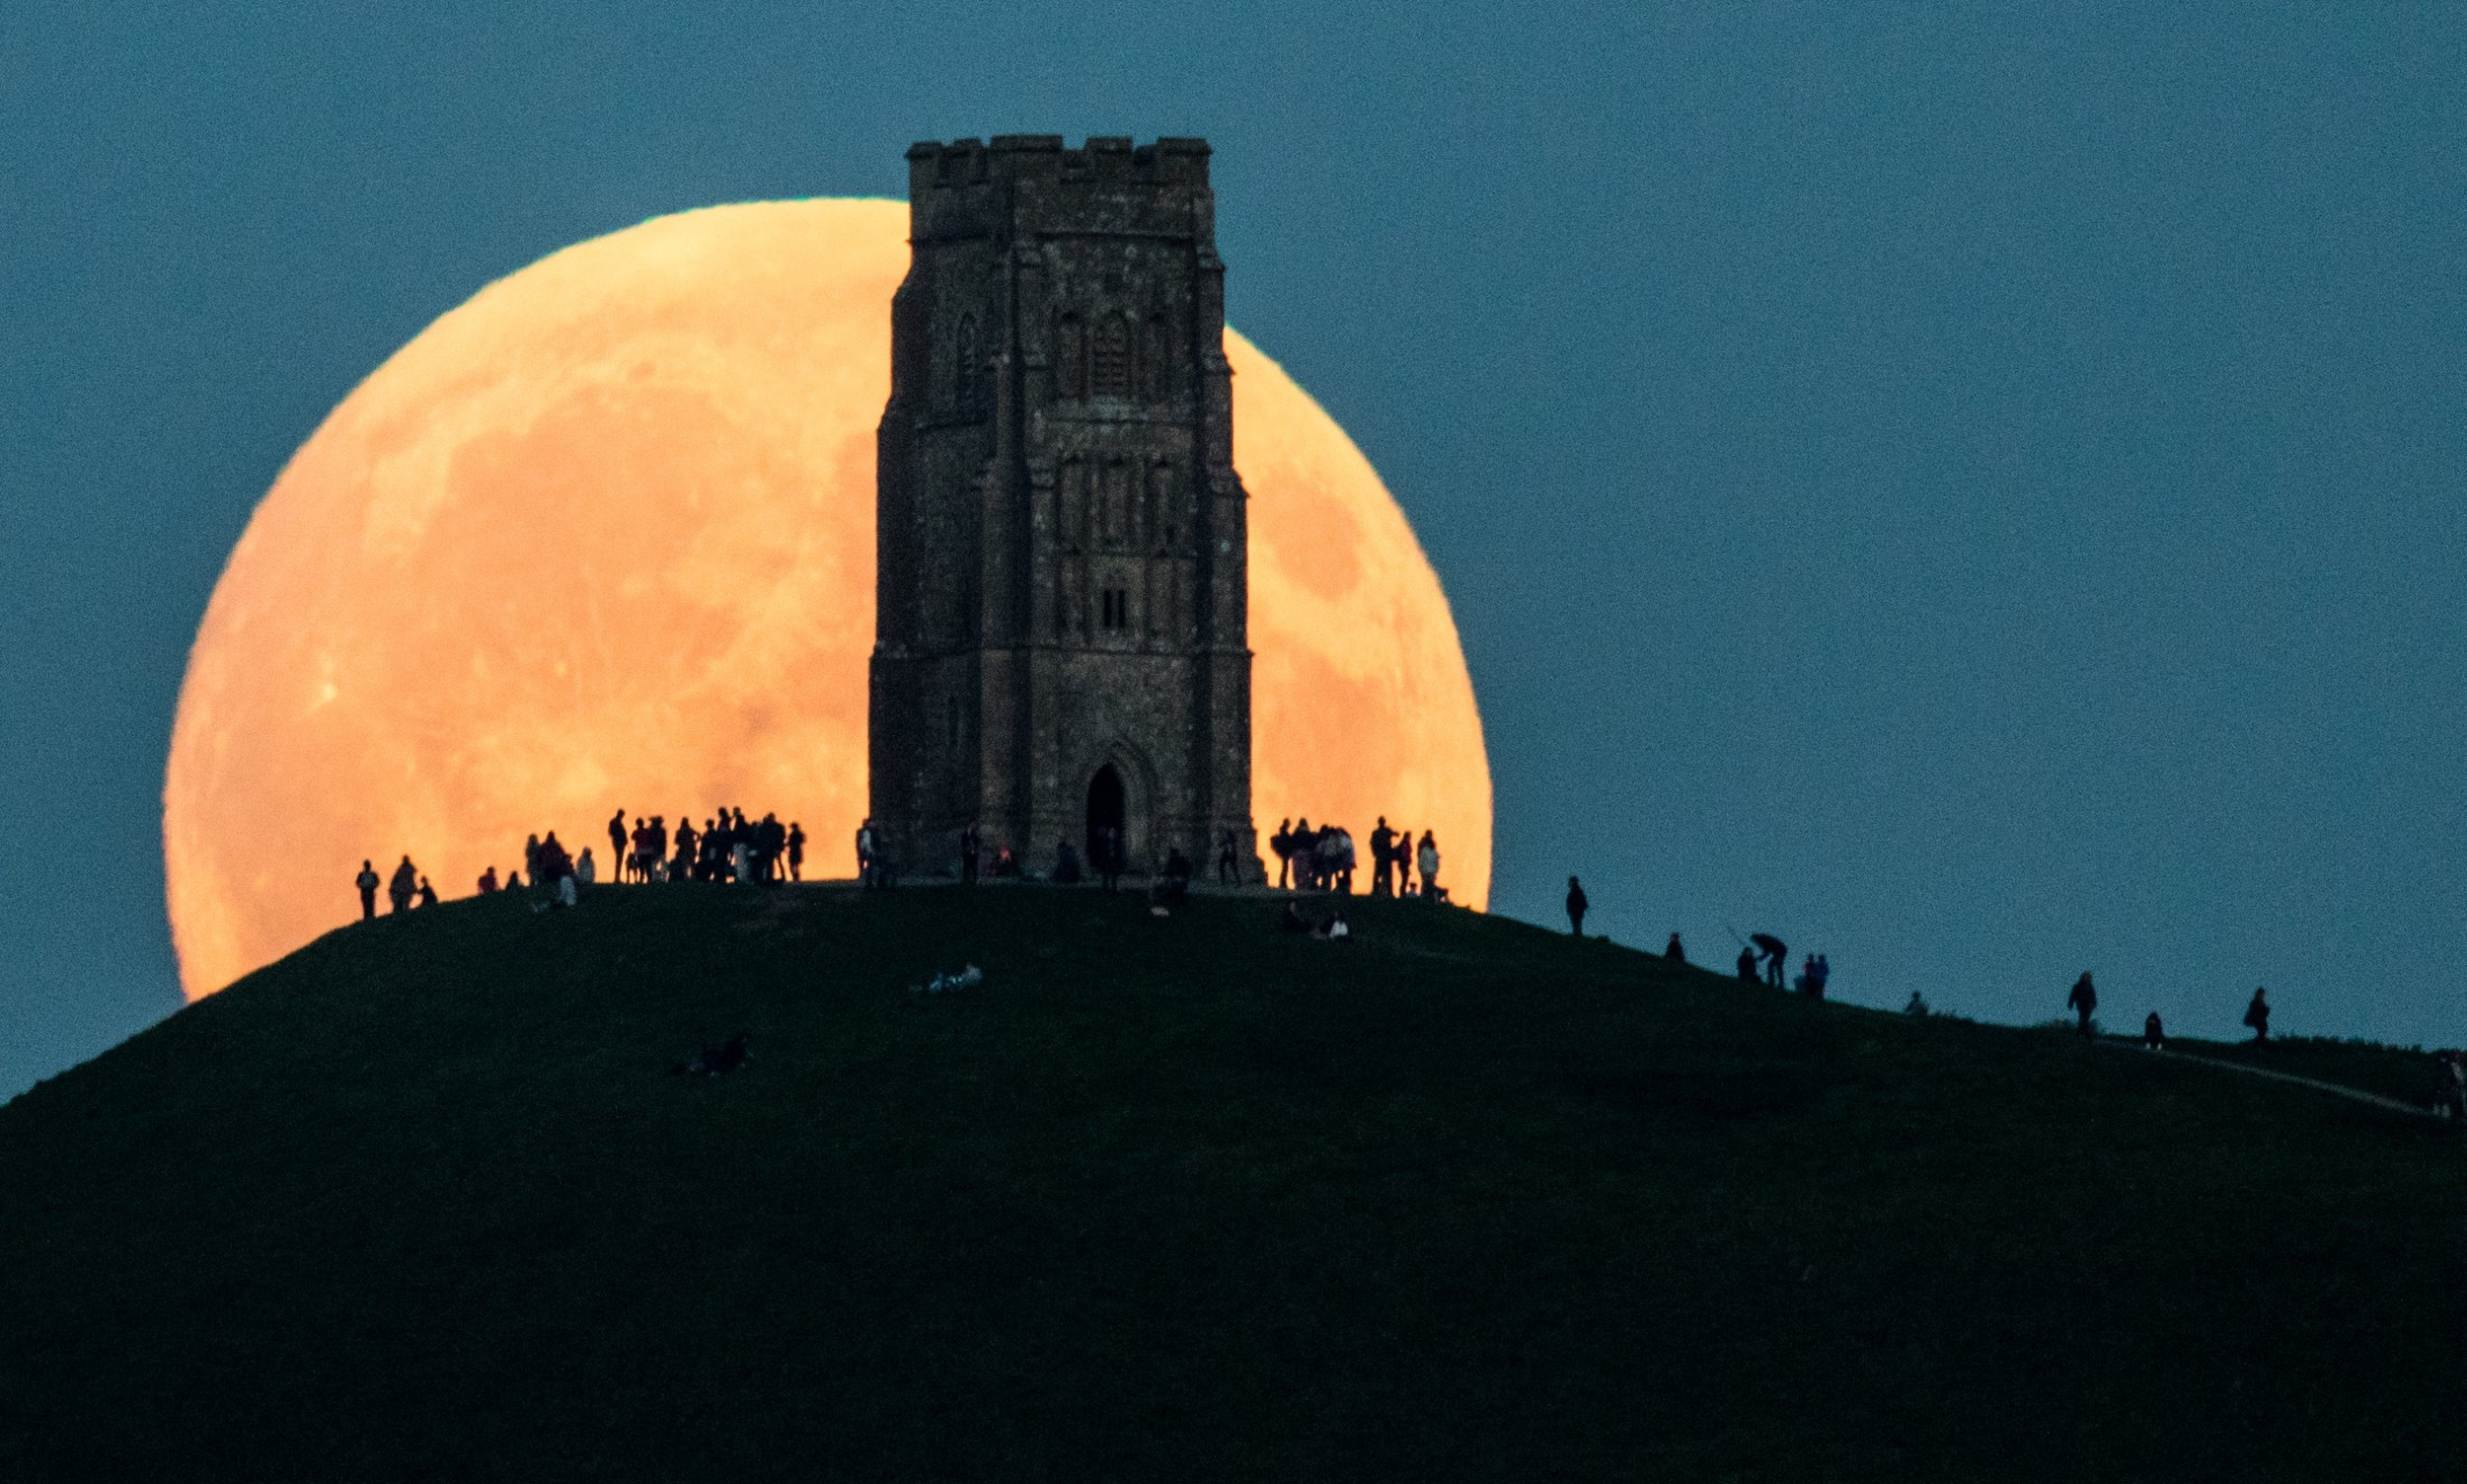 1_24_Glastonbury lunar eclipse